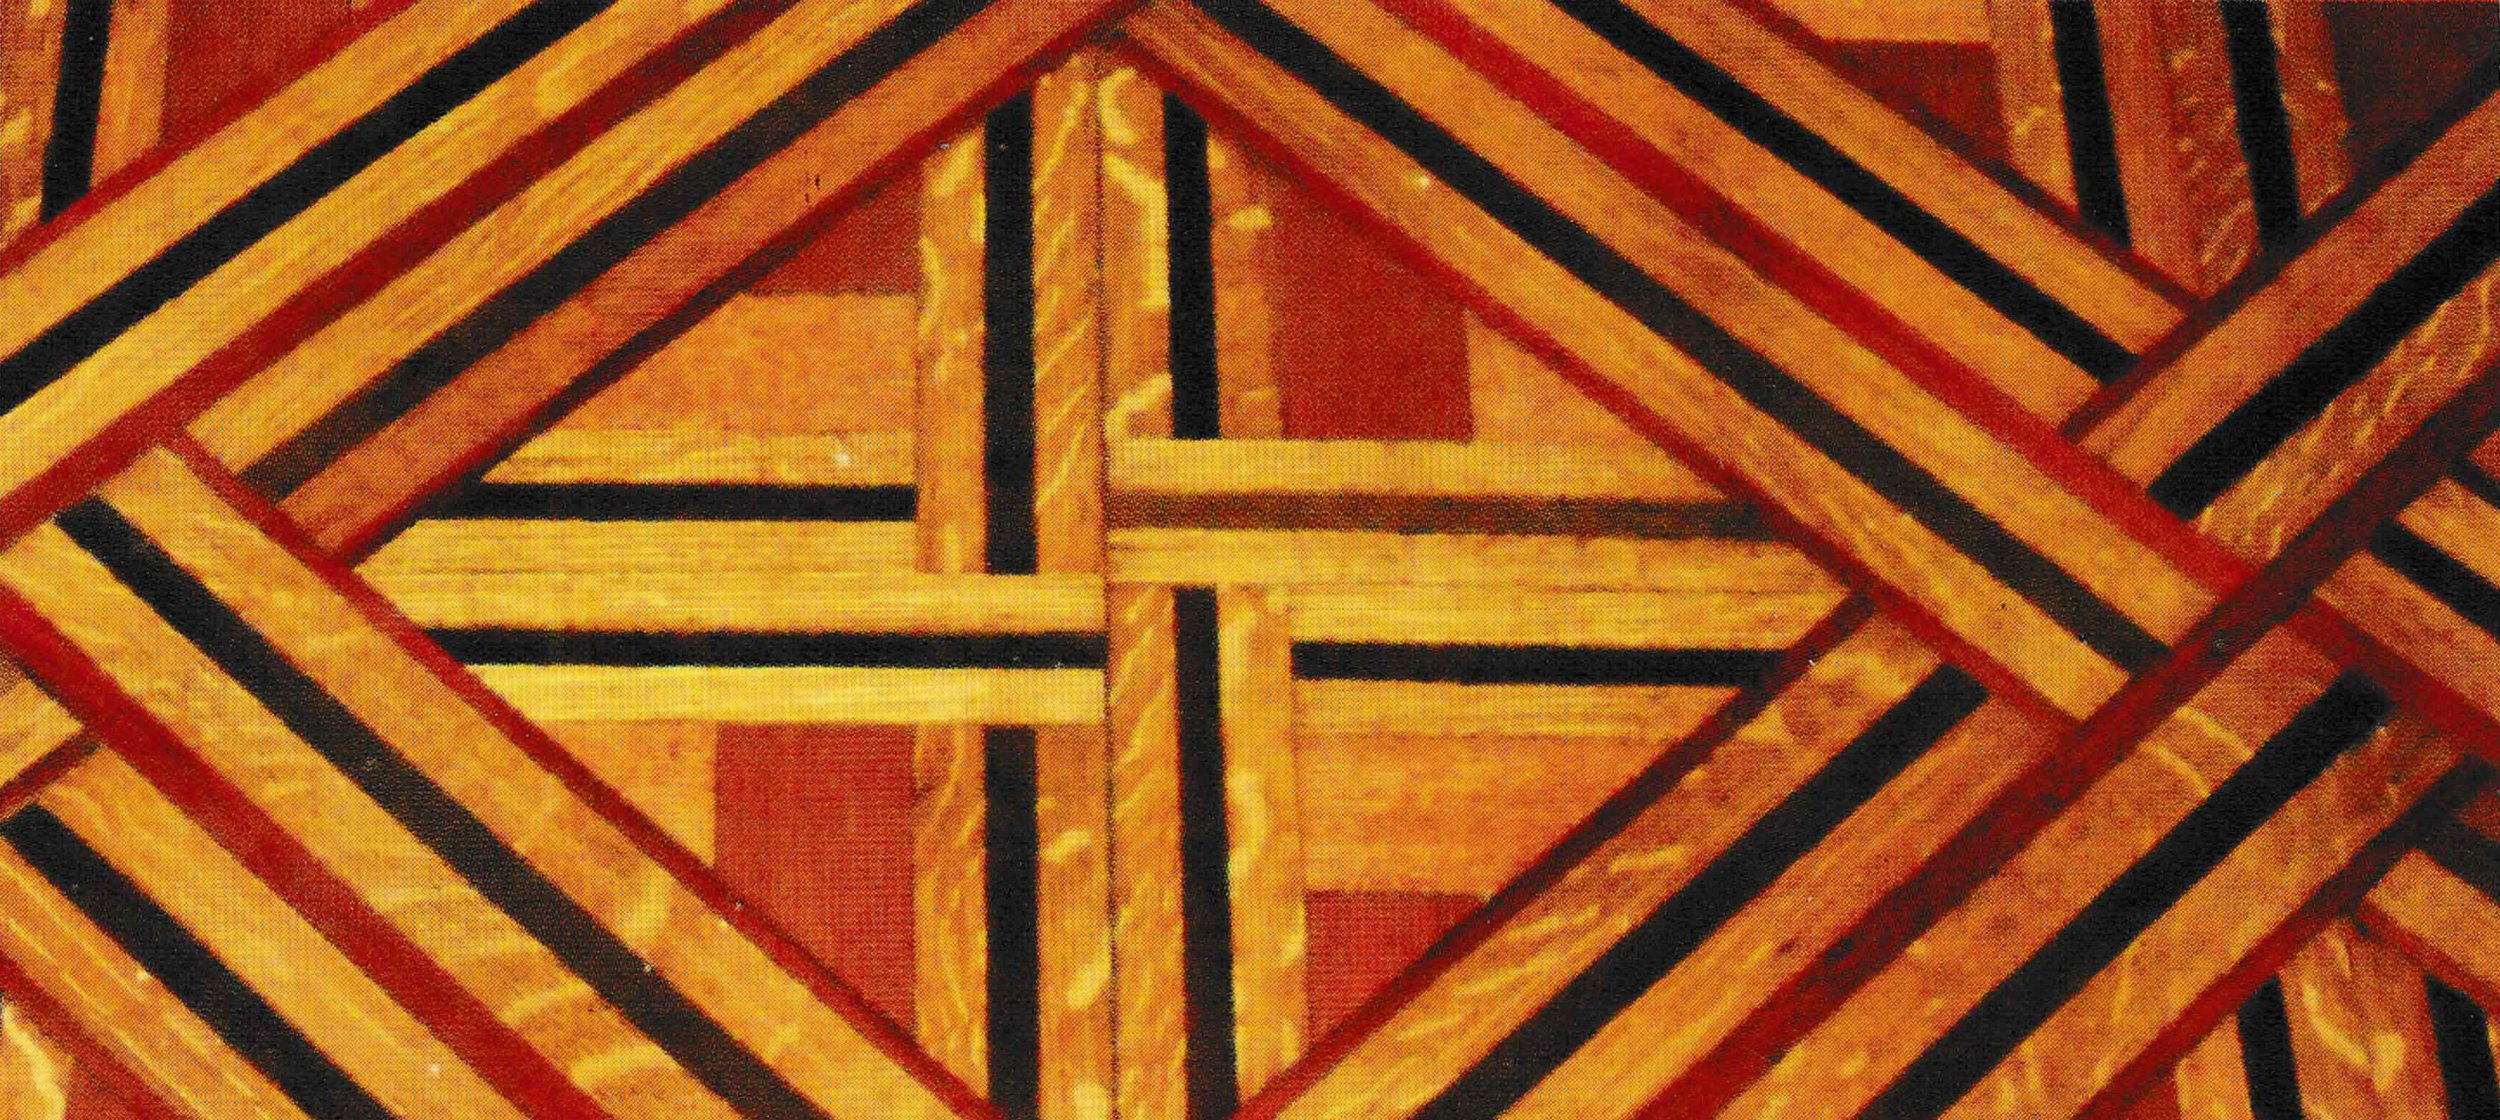 Conservation of wooden floor element, Mansfield Traquair, Edinburgh.